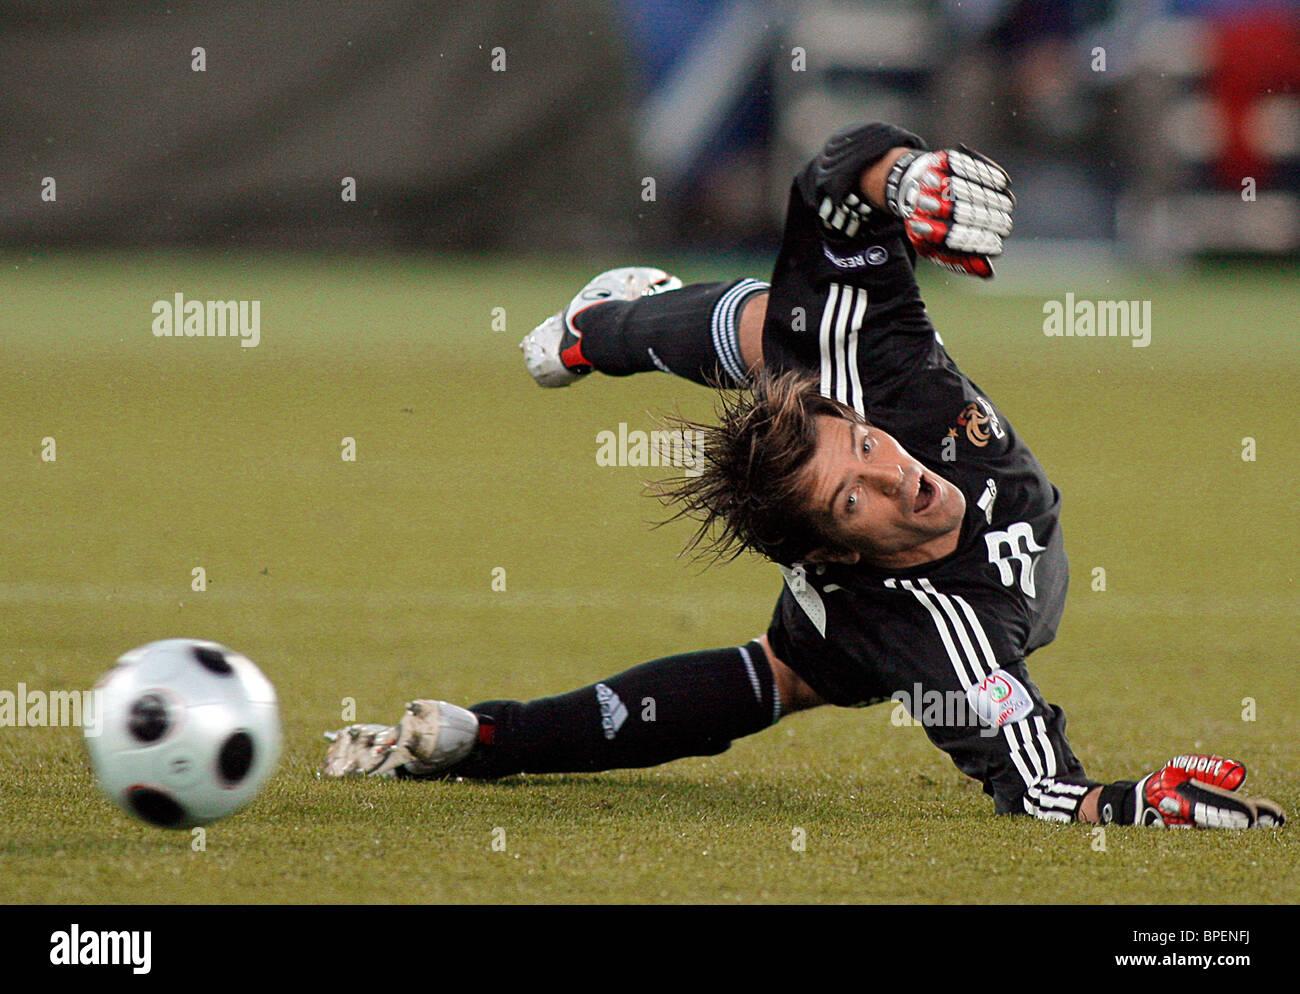 Italy Goalkeeper Stock Photos & Italy Goalkeeper Stock Images - Alamy